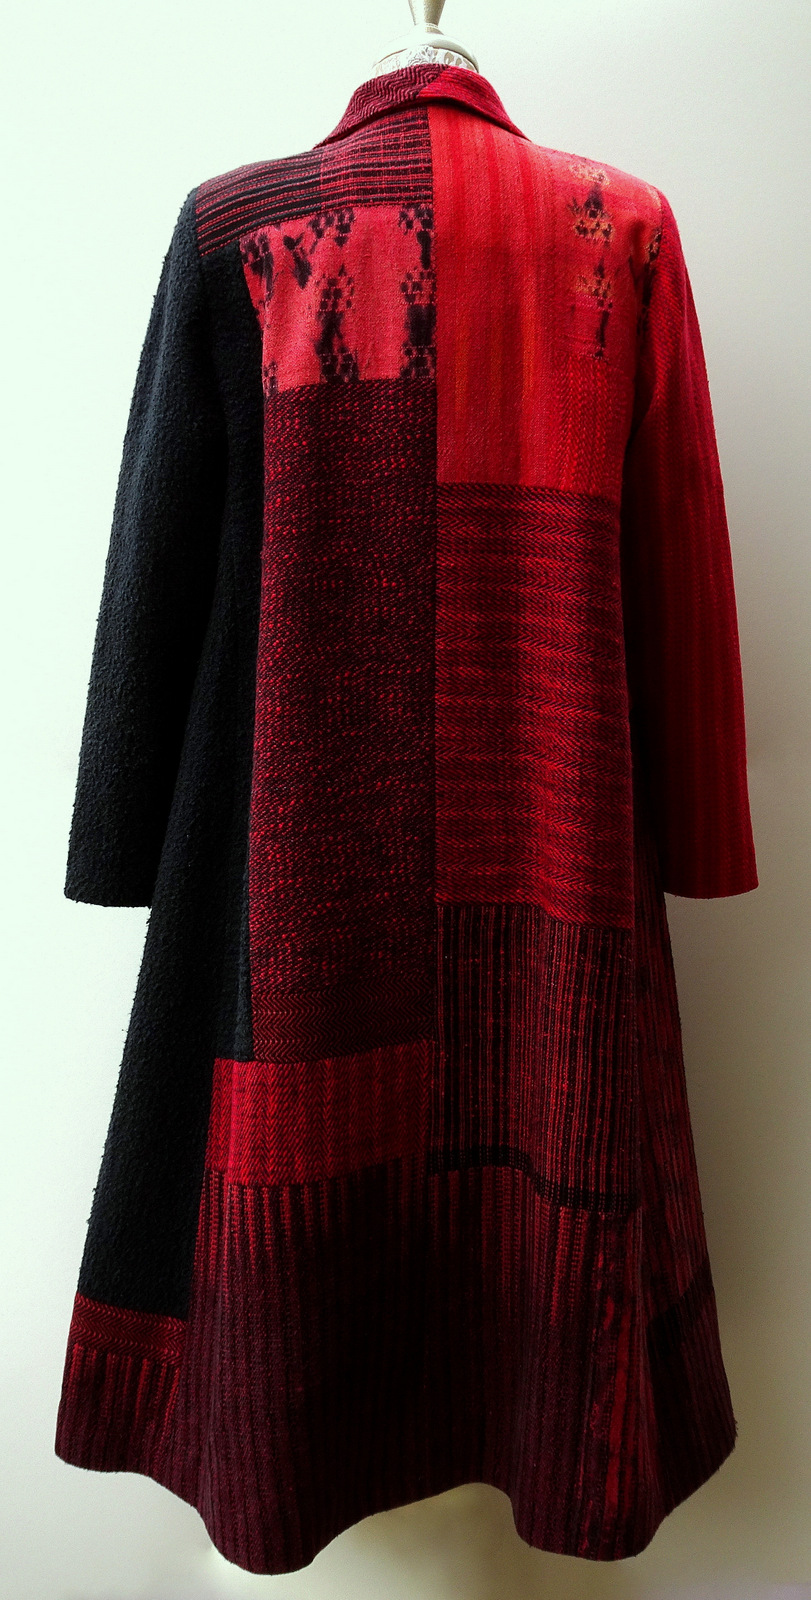 Handwoven Slow Fashion by Liz Spear-009.JPG